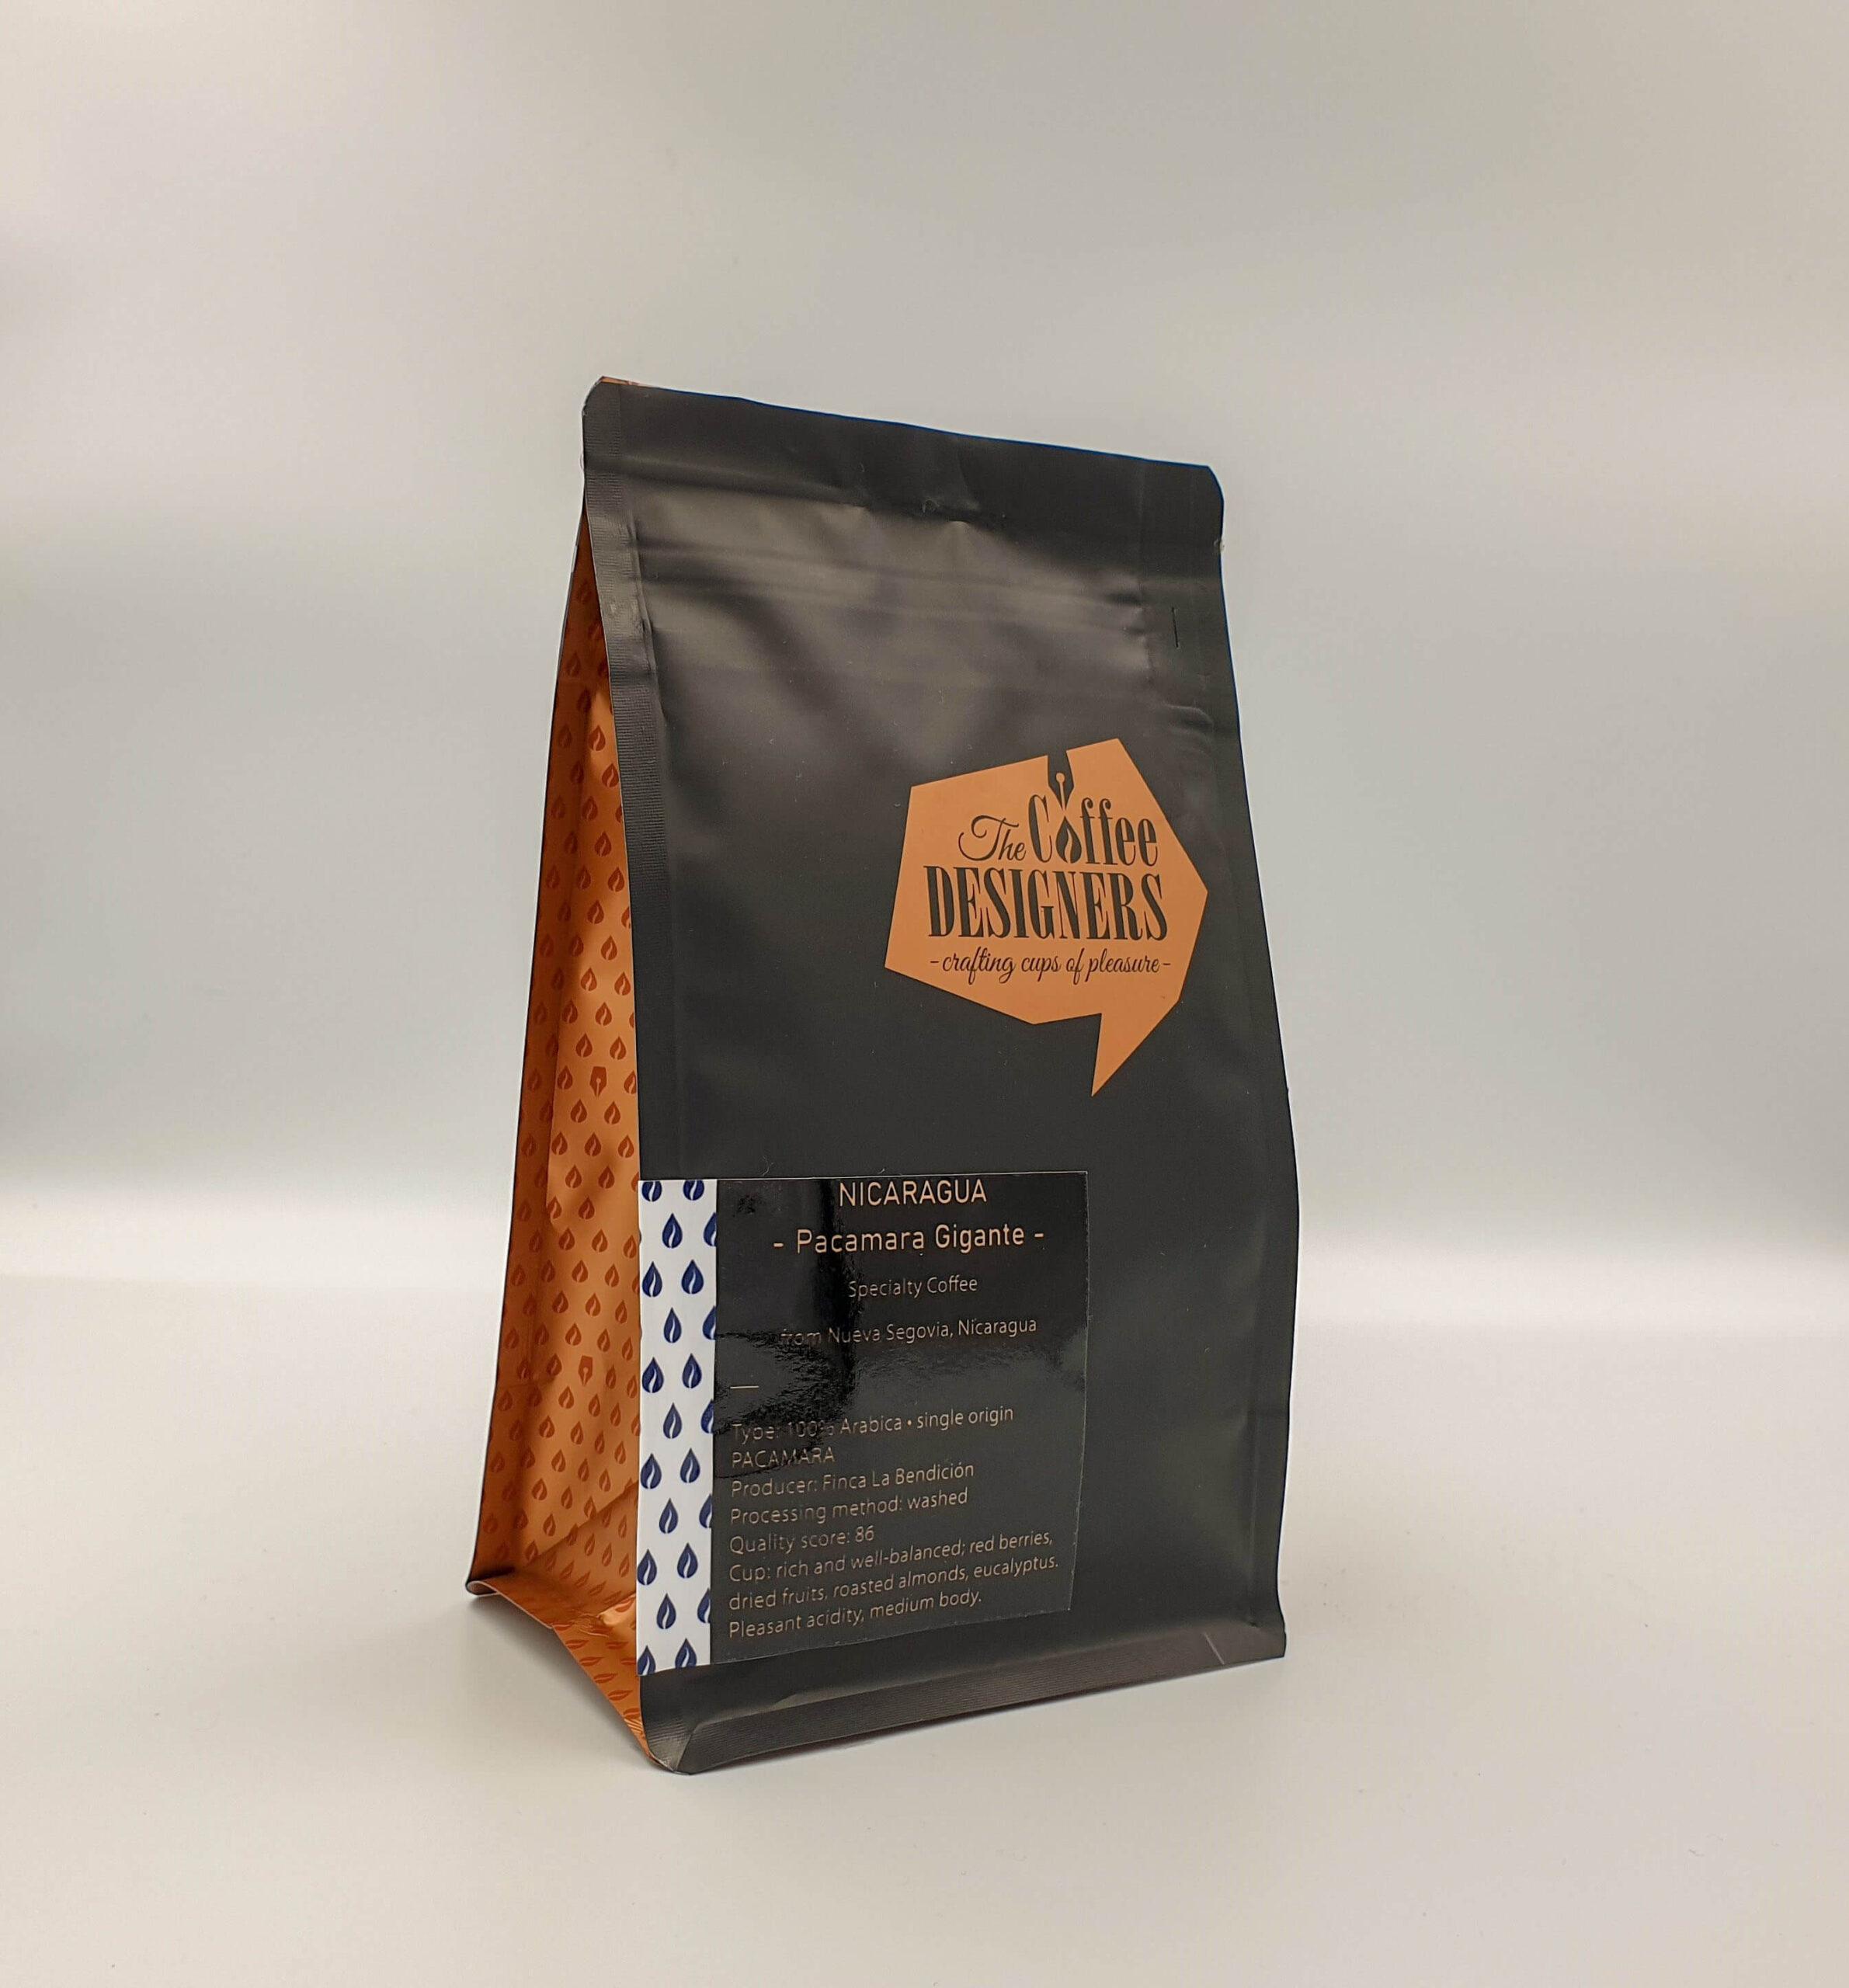 Cafea-de-specialitate_Nicaragua_Pacamara-Gigante_Coffee-Designers